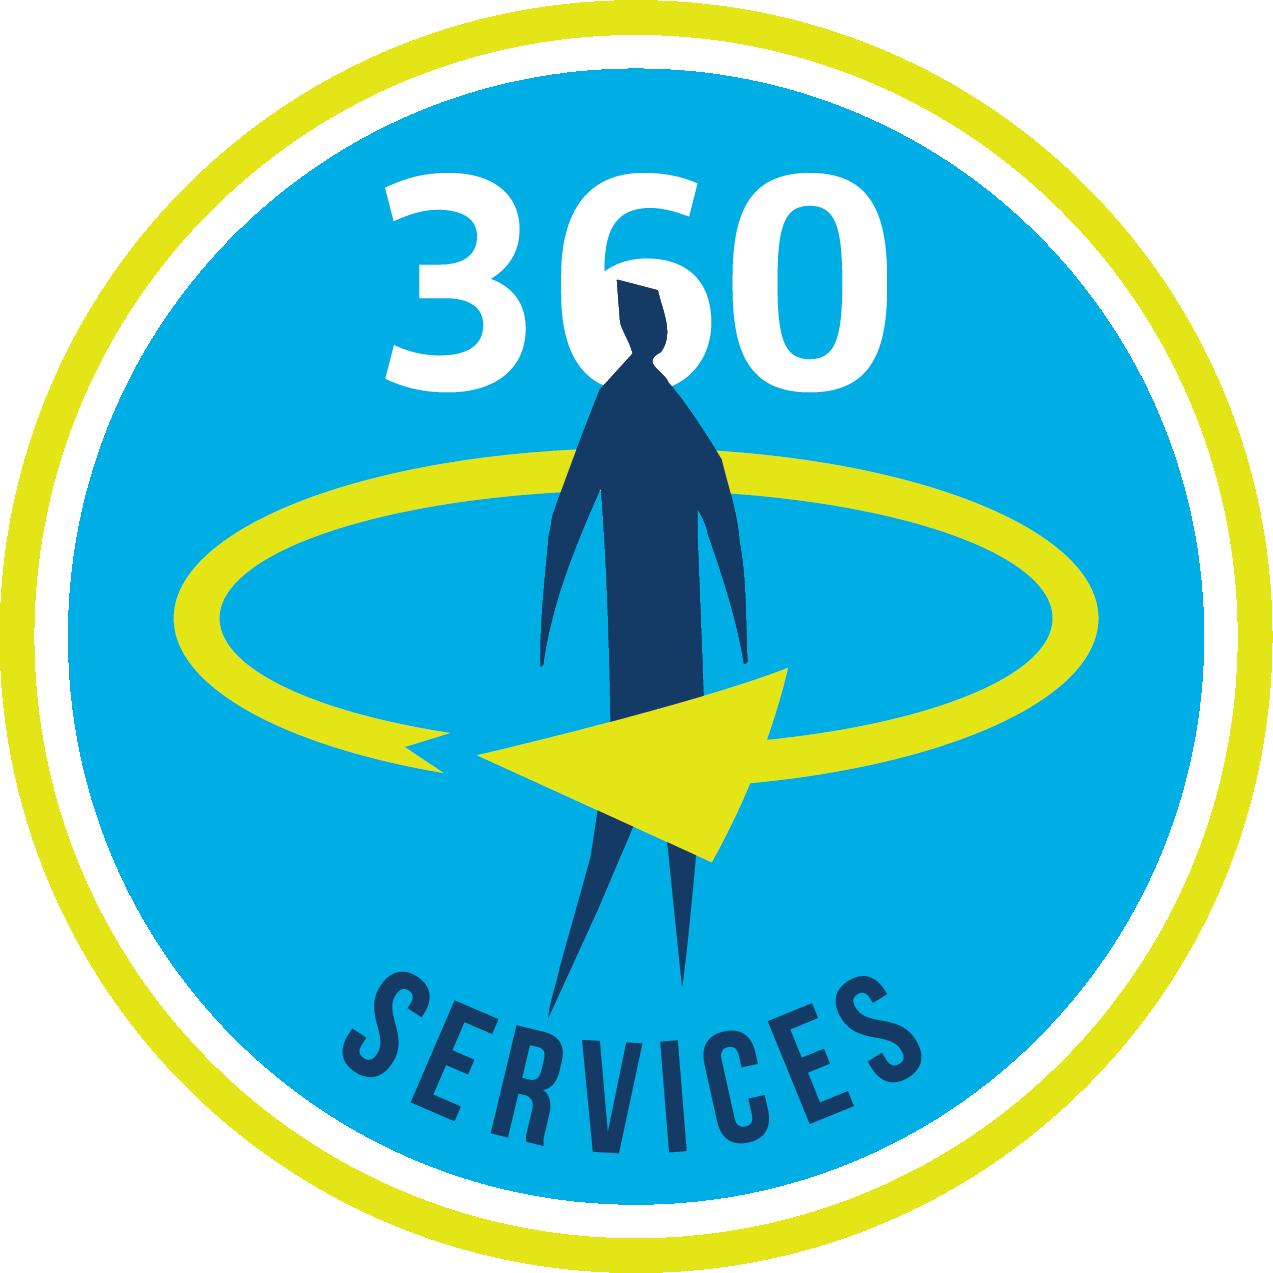 aclvb-universele_diensten-logo-cmyk_ok_fr_7.png